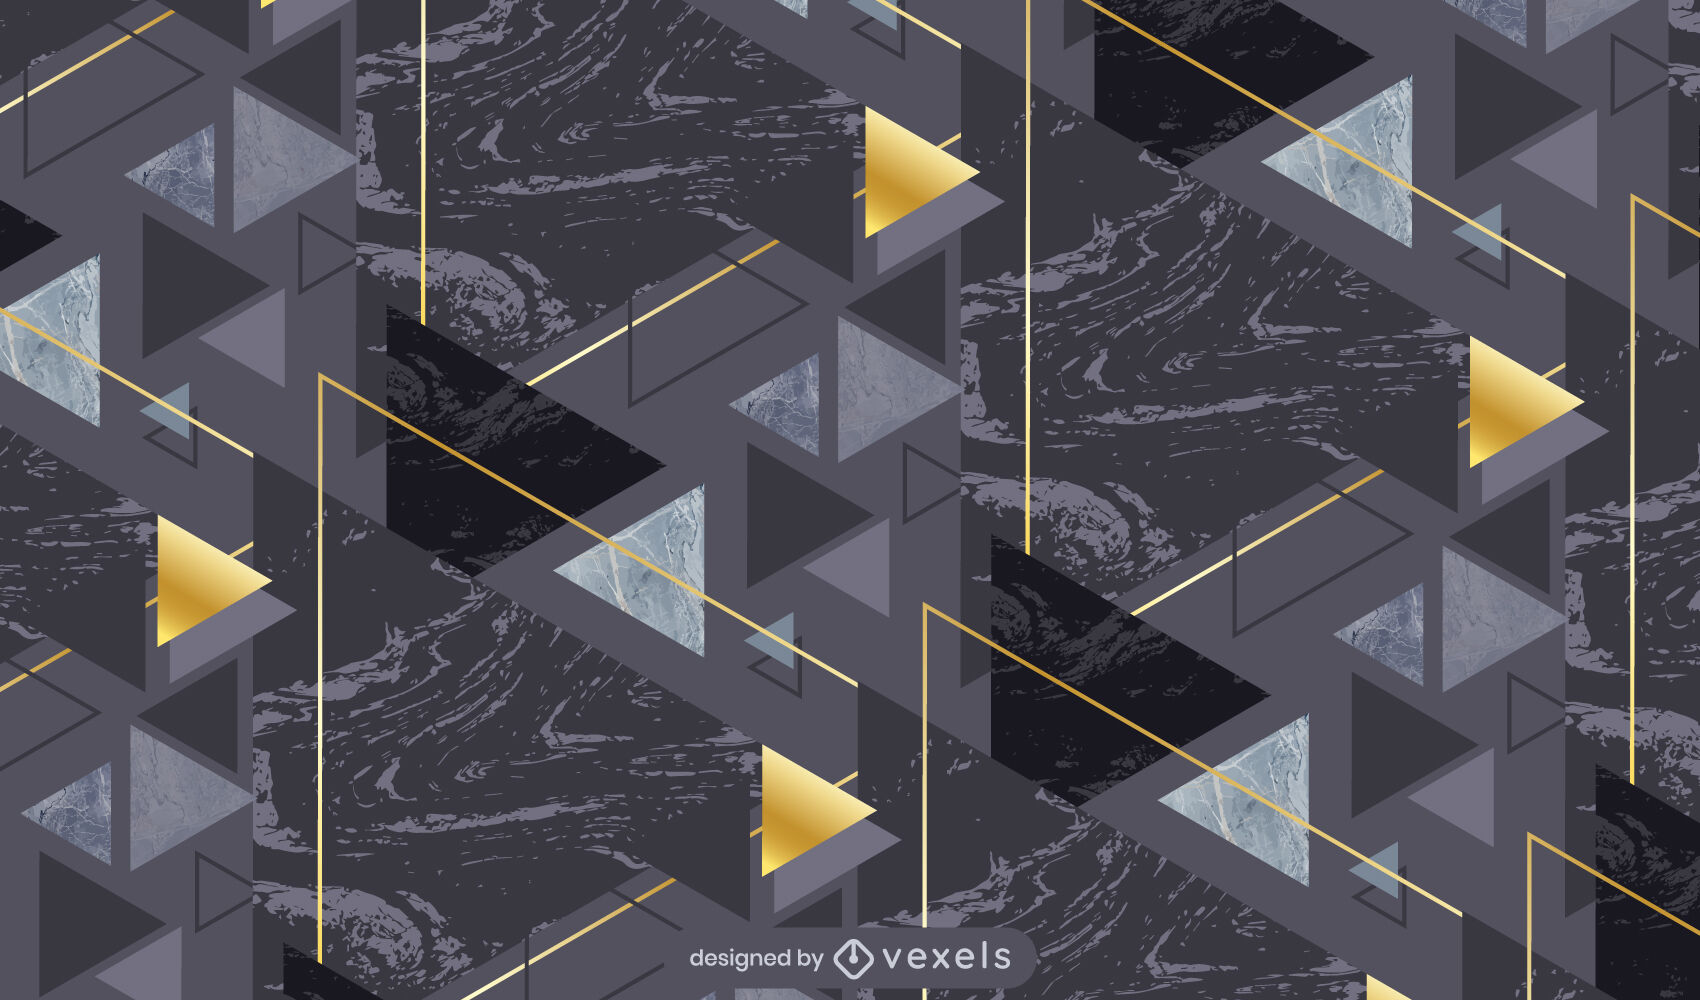 Geometrisches Muster aus dunklem Marmor